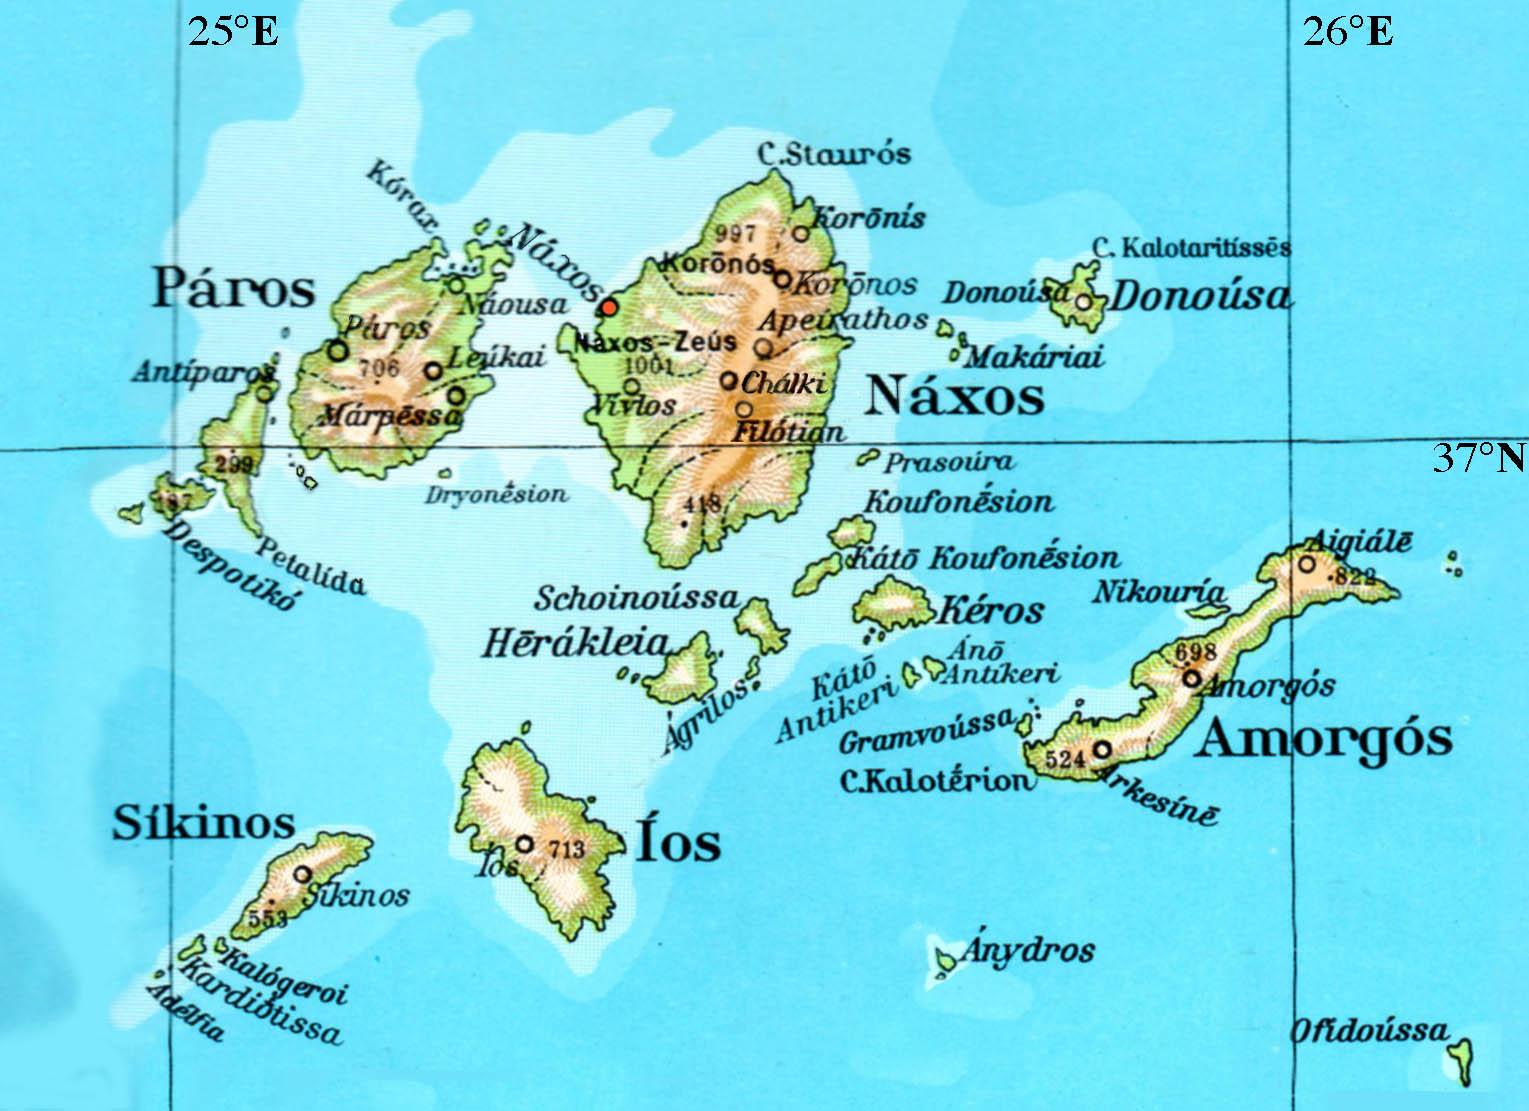 Nàxos and Despotikos